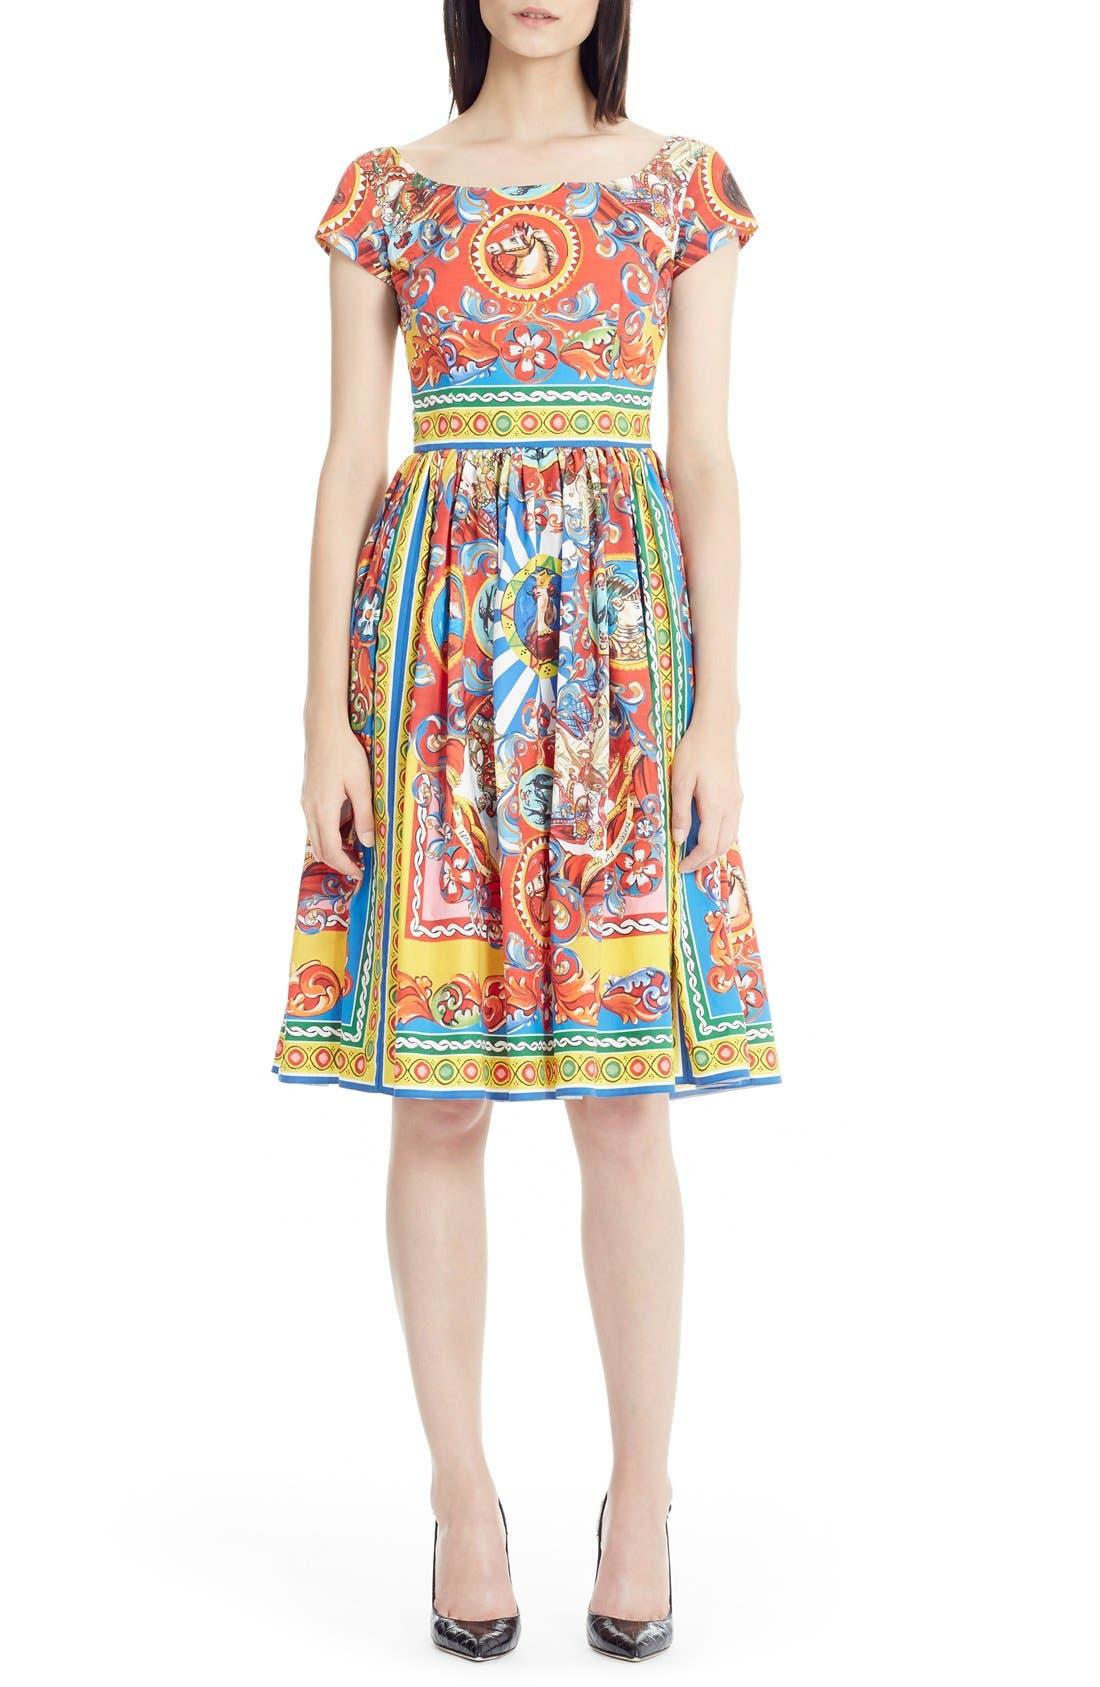 Main Image - Dolce&Gabbana Carretto Print Cotton Poplin Dress